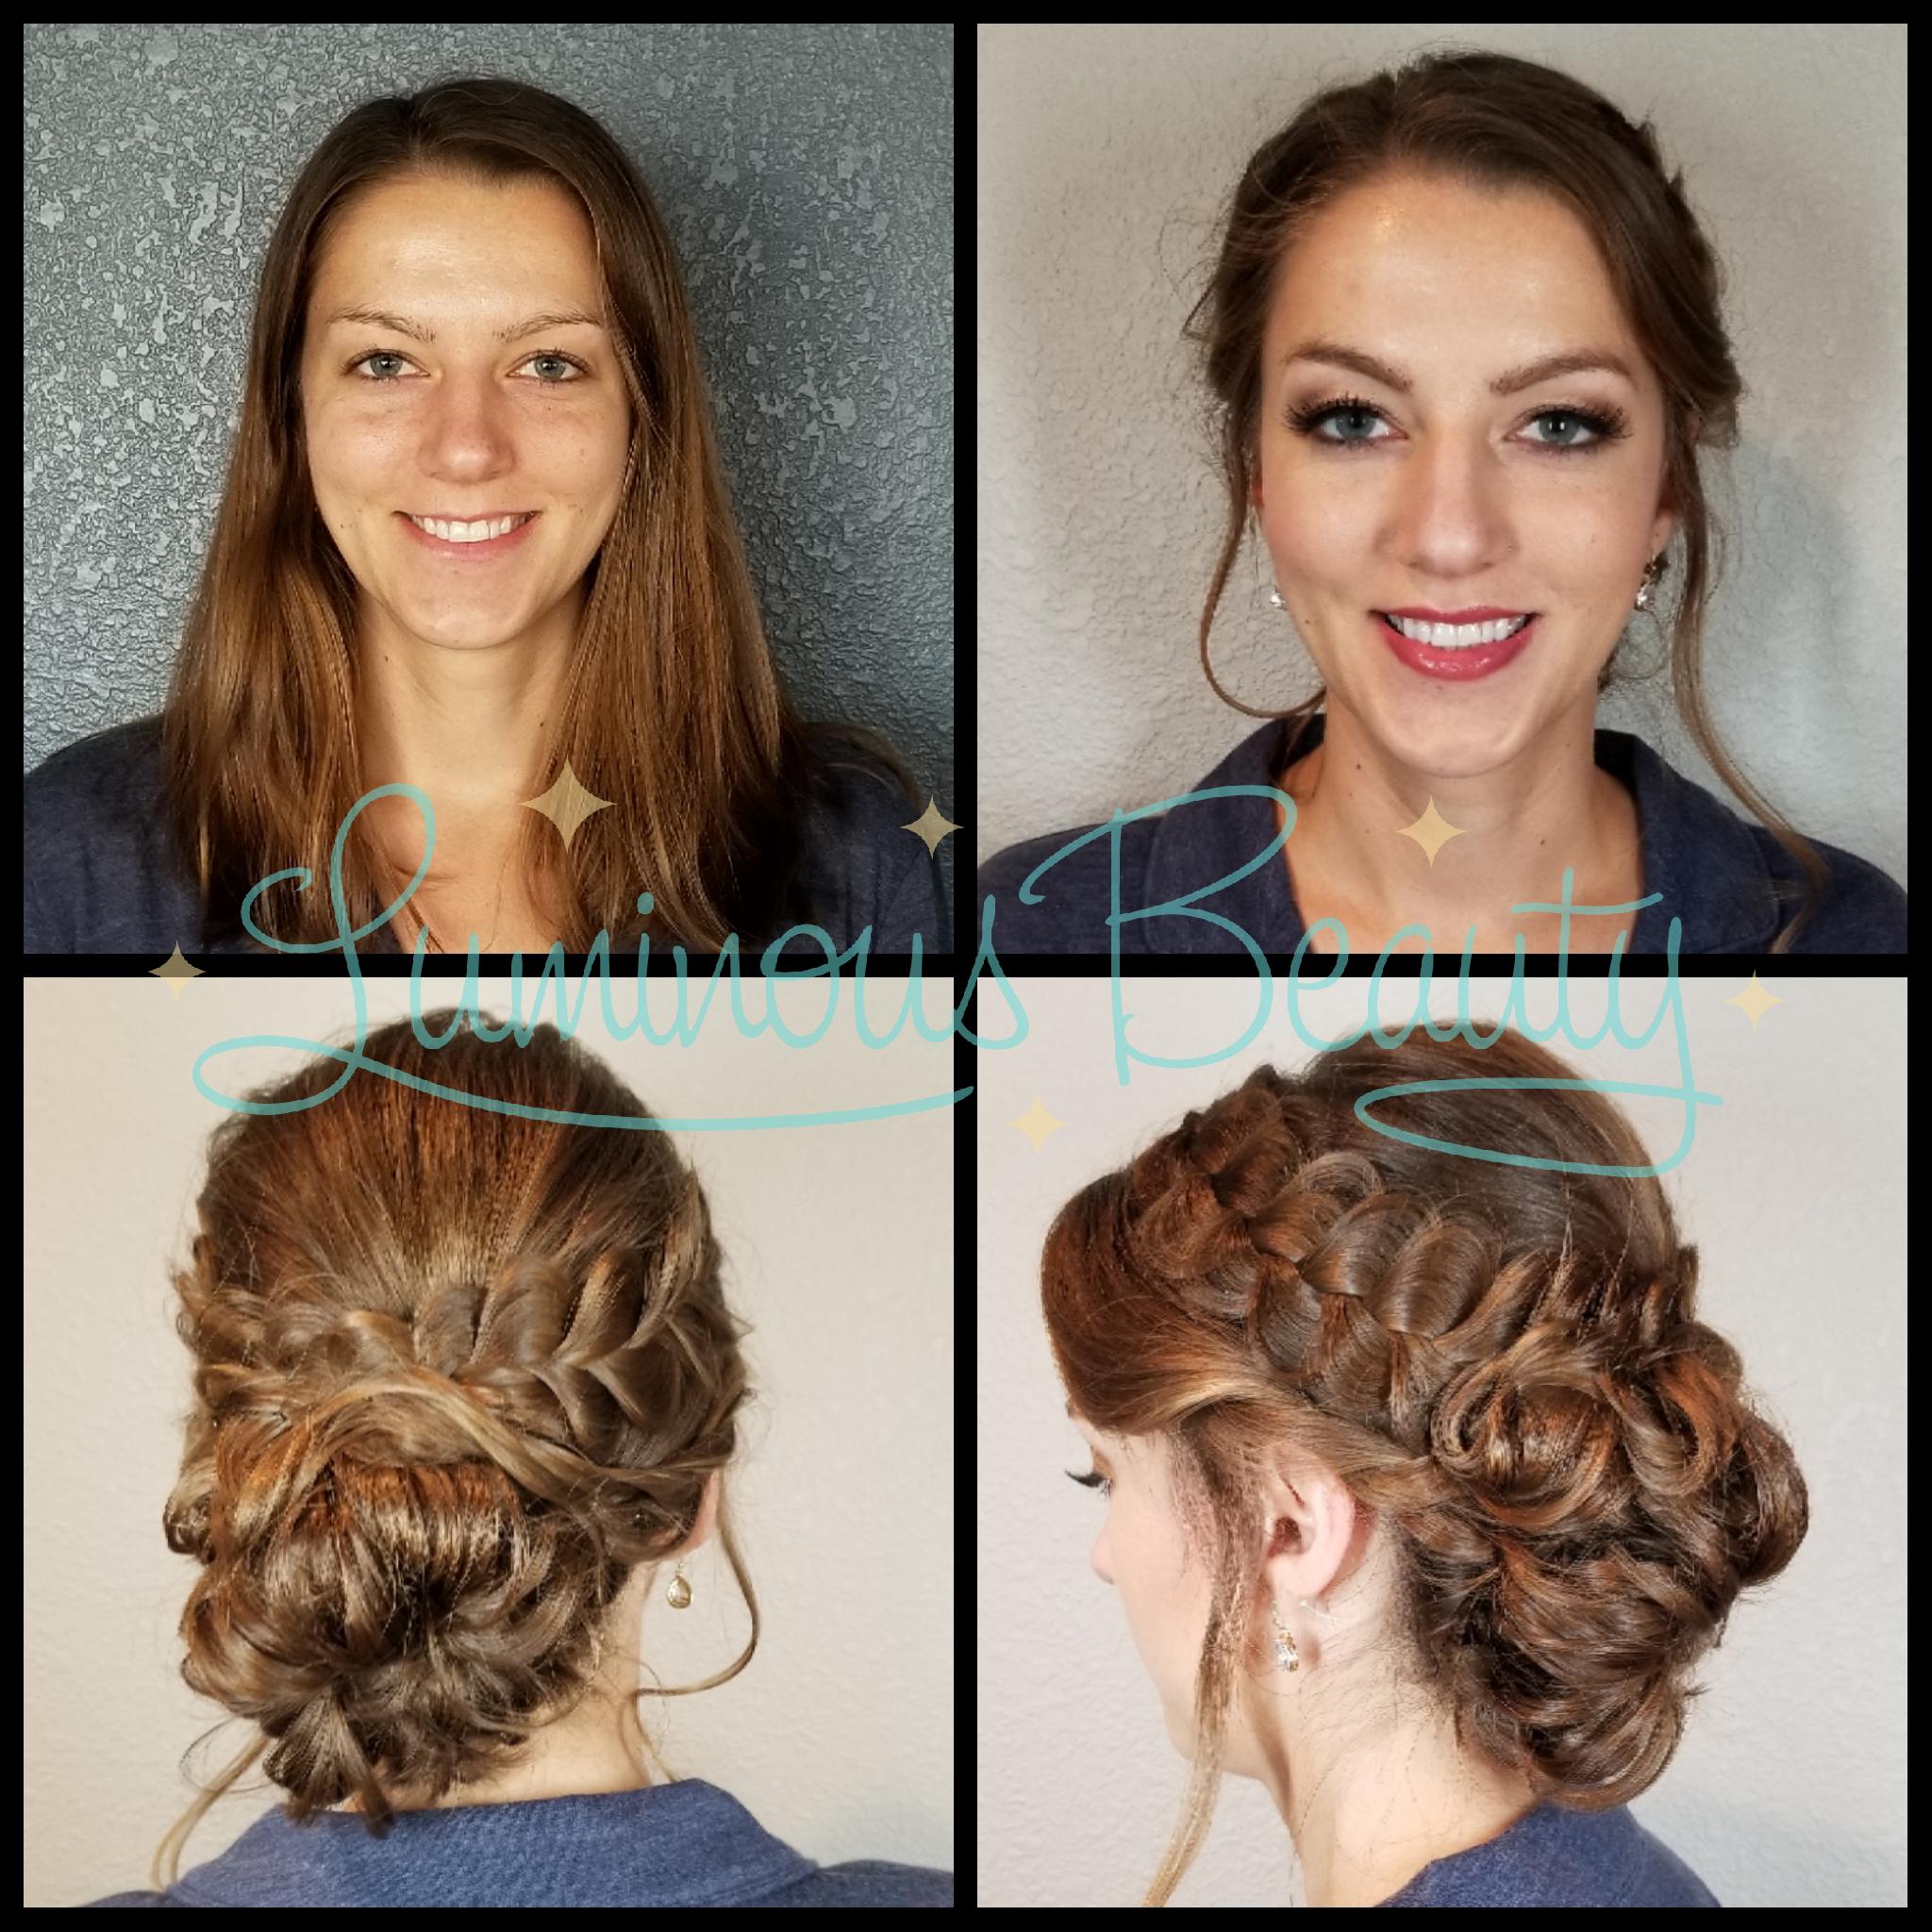 Bridesmaid's Hair & Makeup. Soft Loopung Updo with Braid. Pkum Smokey Eye, Pink Cheeks, False Lashes. Luminous Beauty Makeup Artist and Luminous Beauty Hairstylist..png